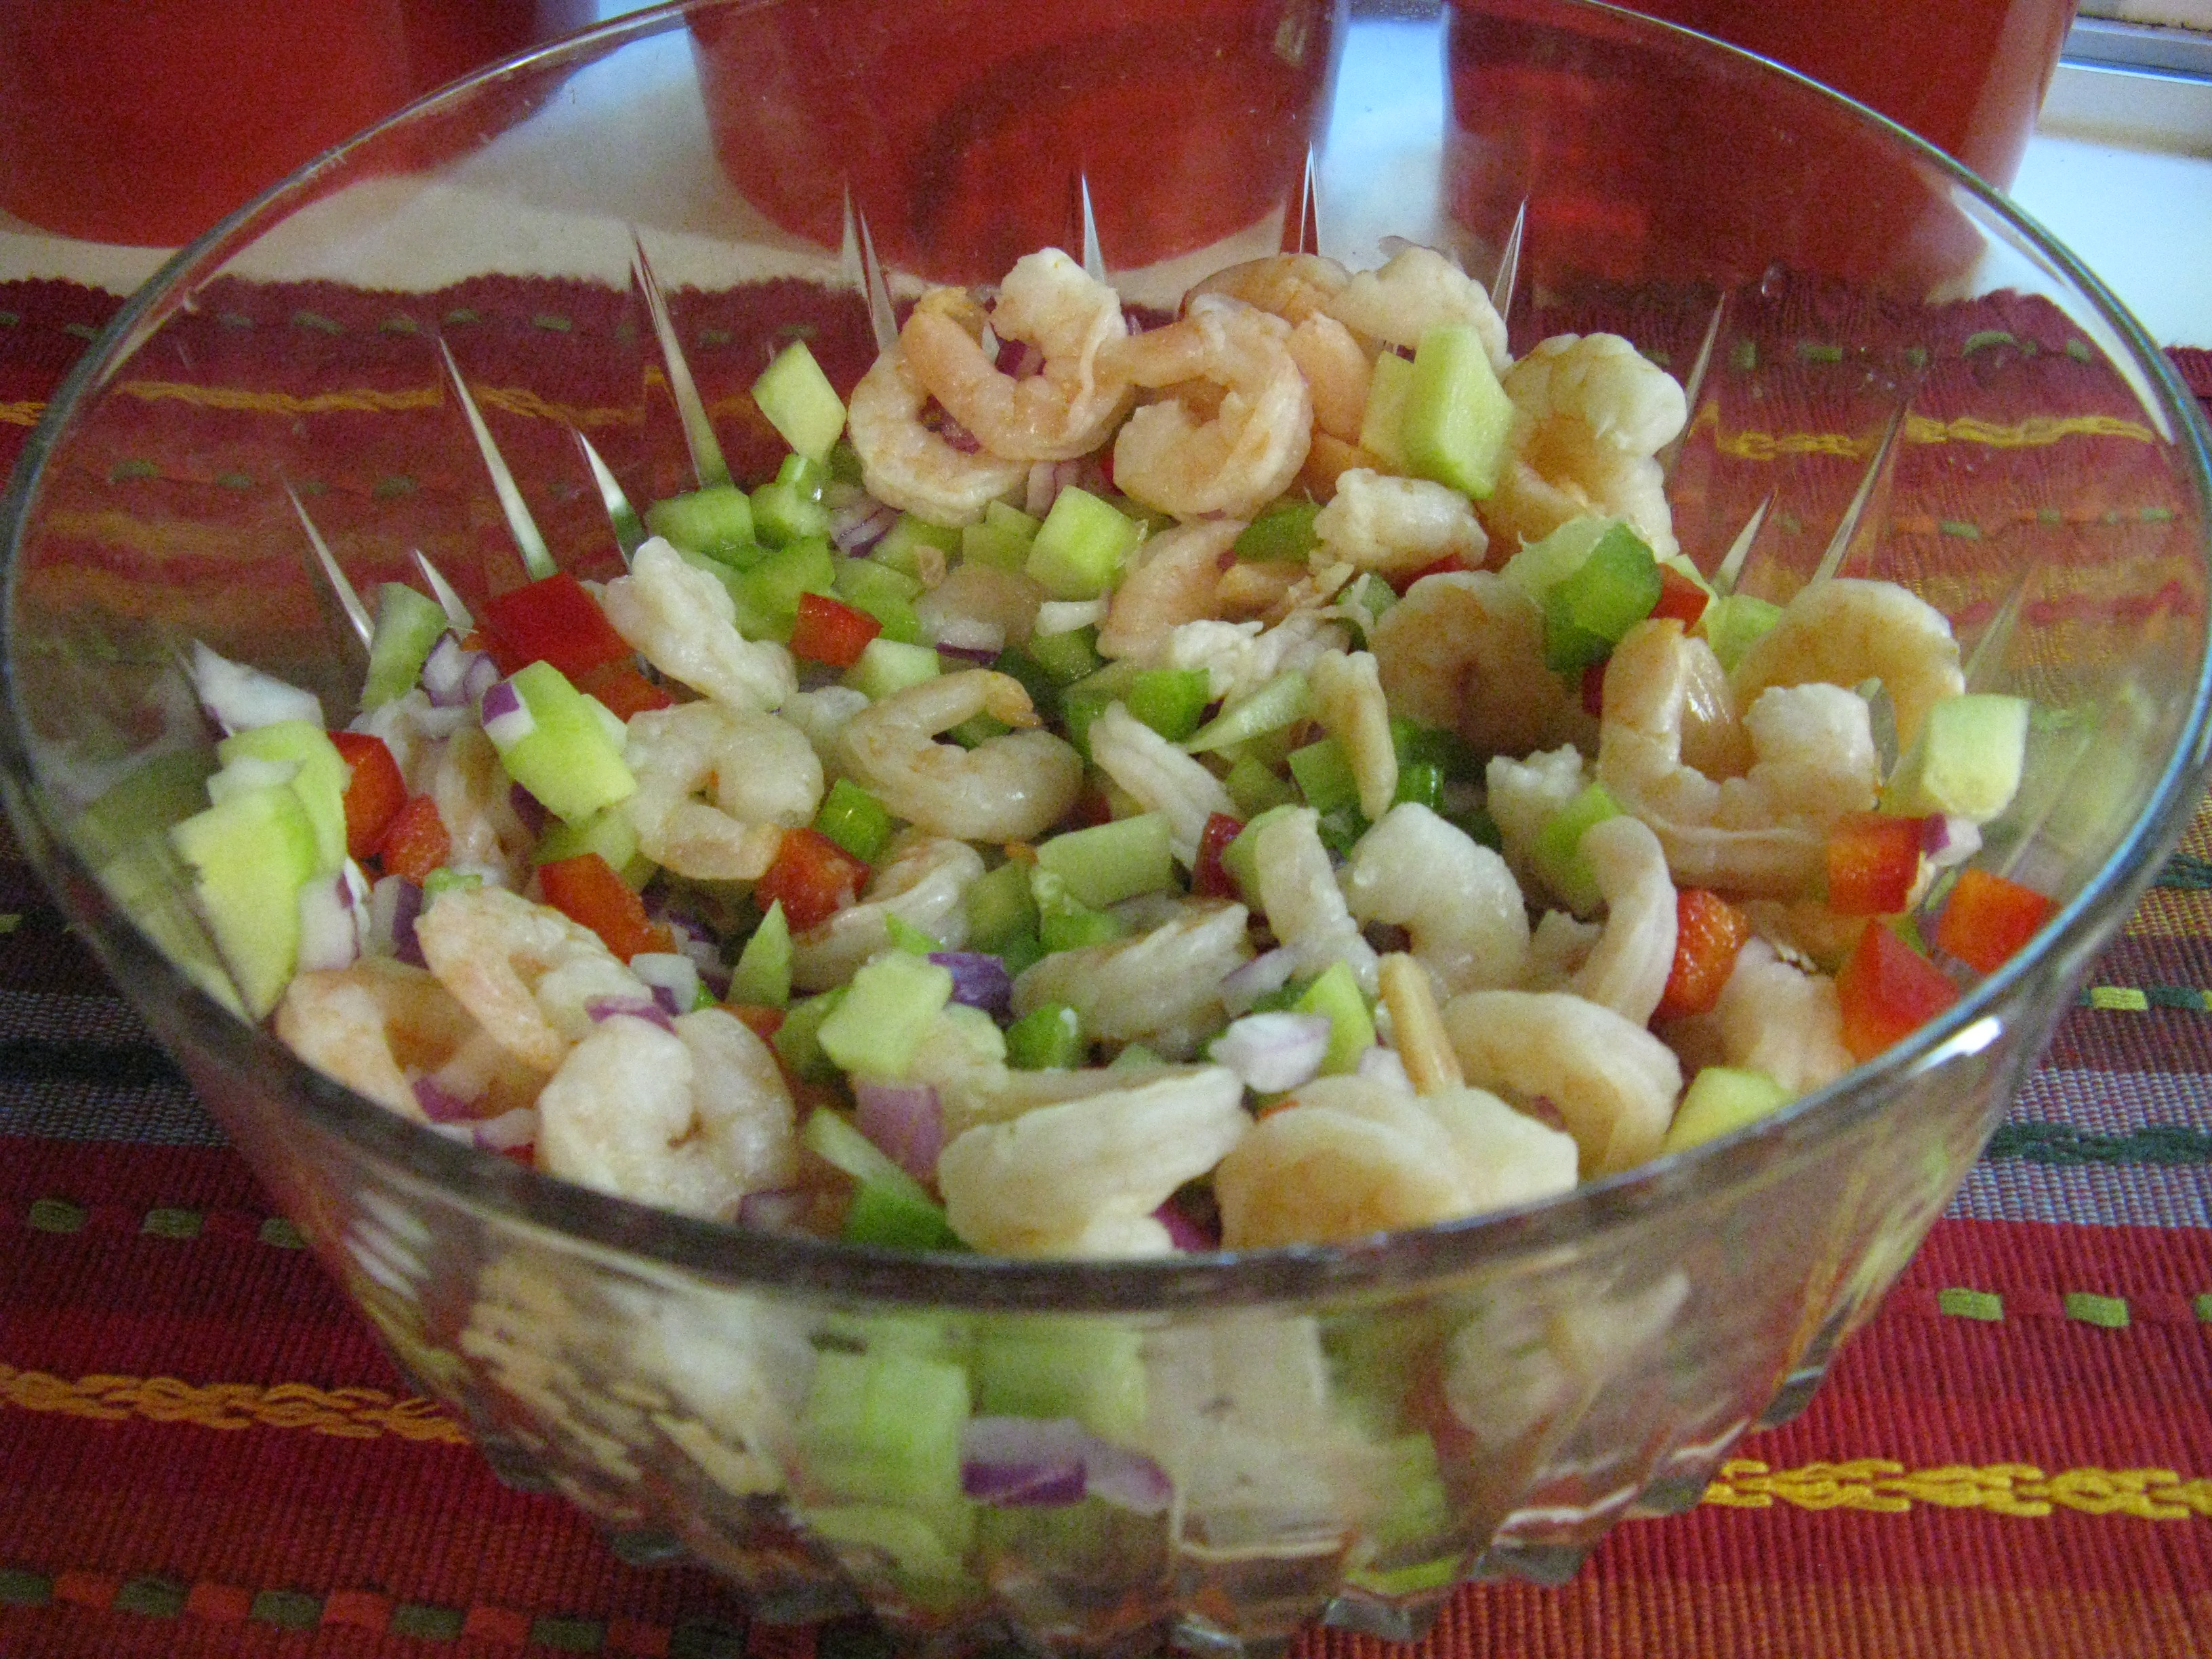 Creamy Shrimp And Celery Salad Recipes — Dishmaps